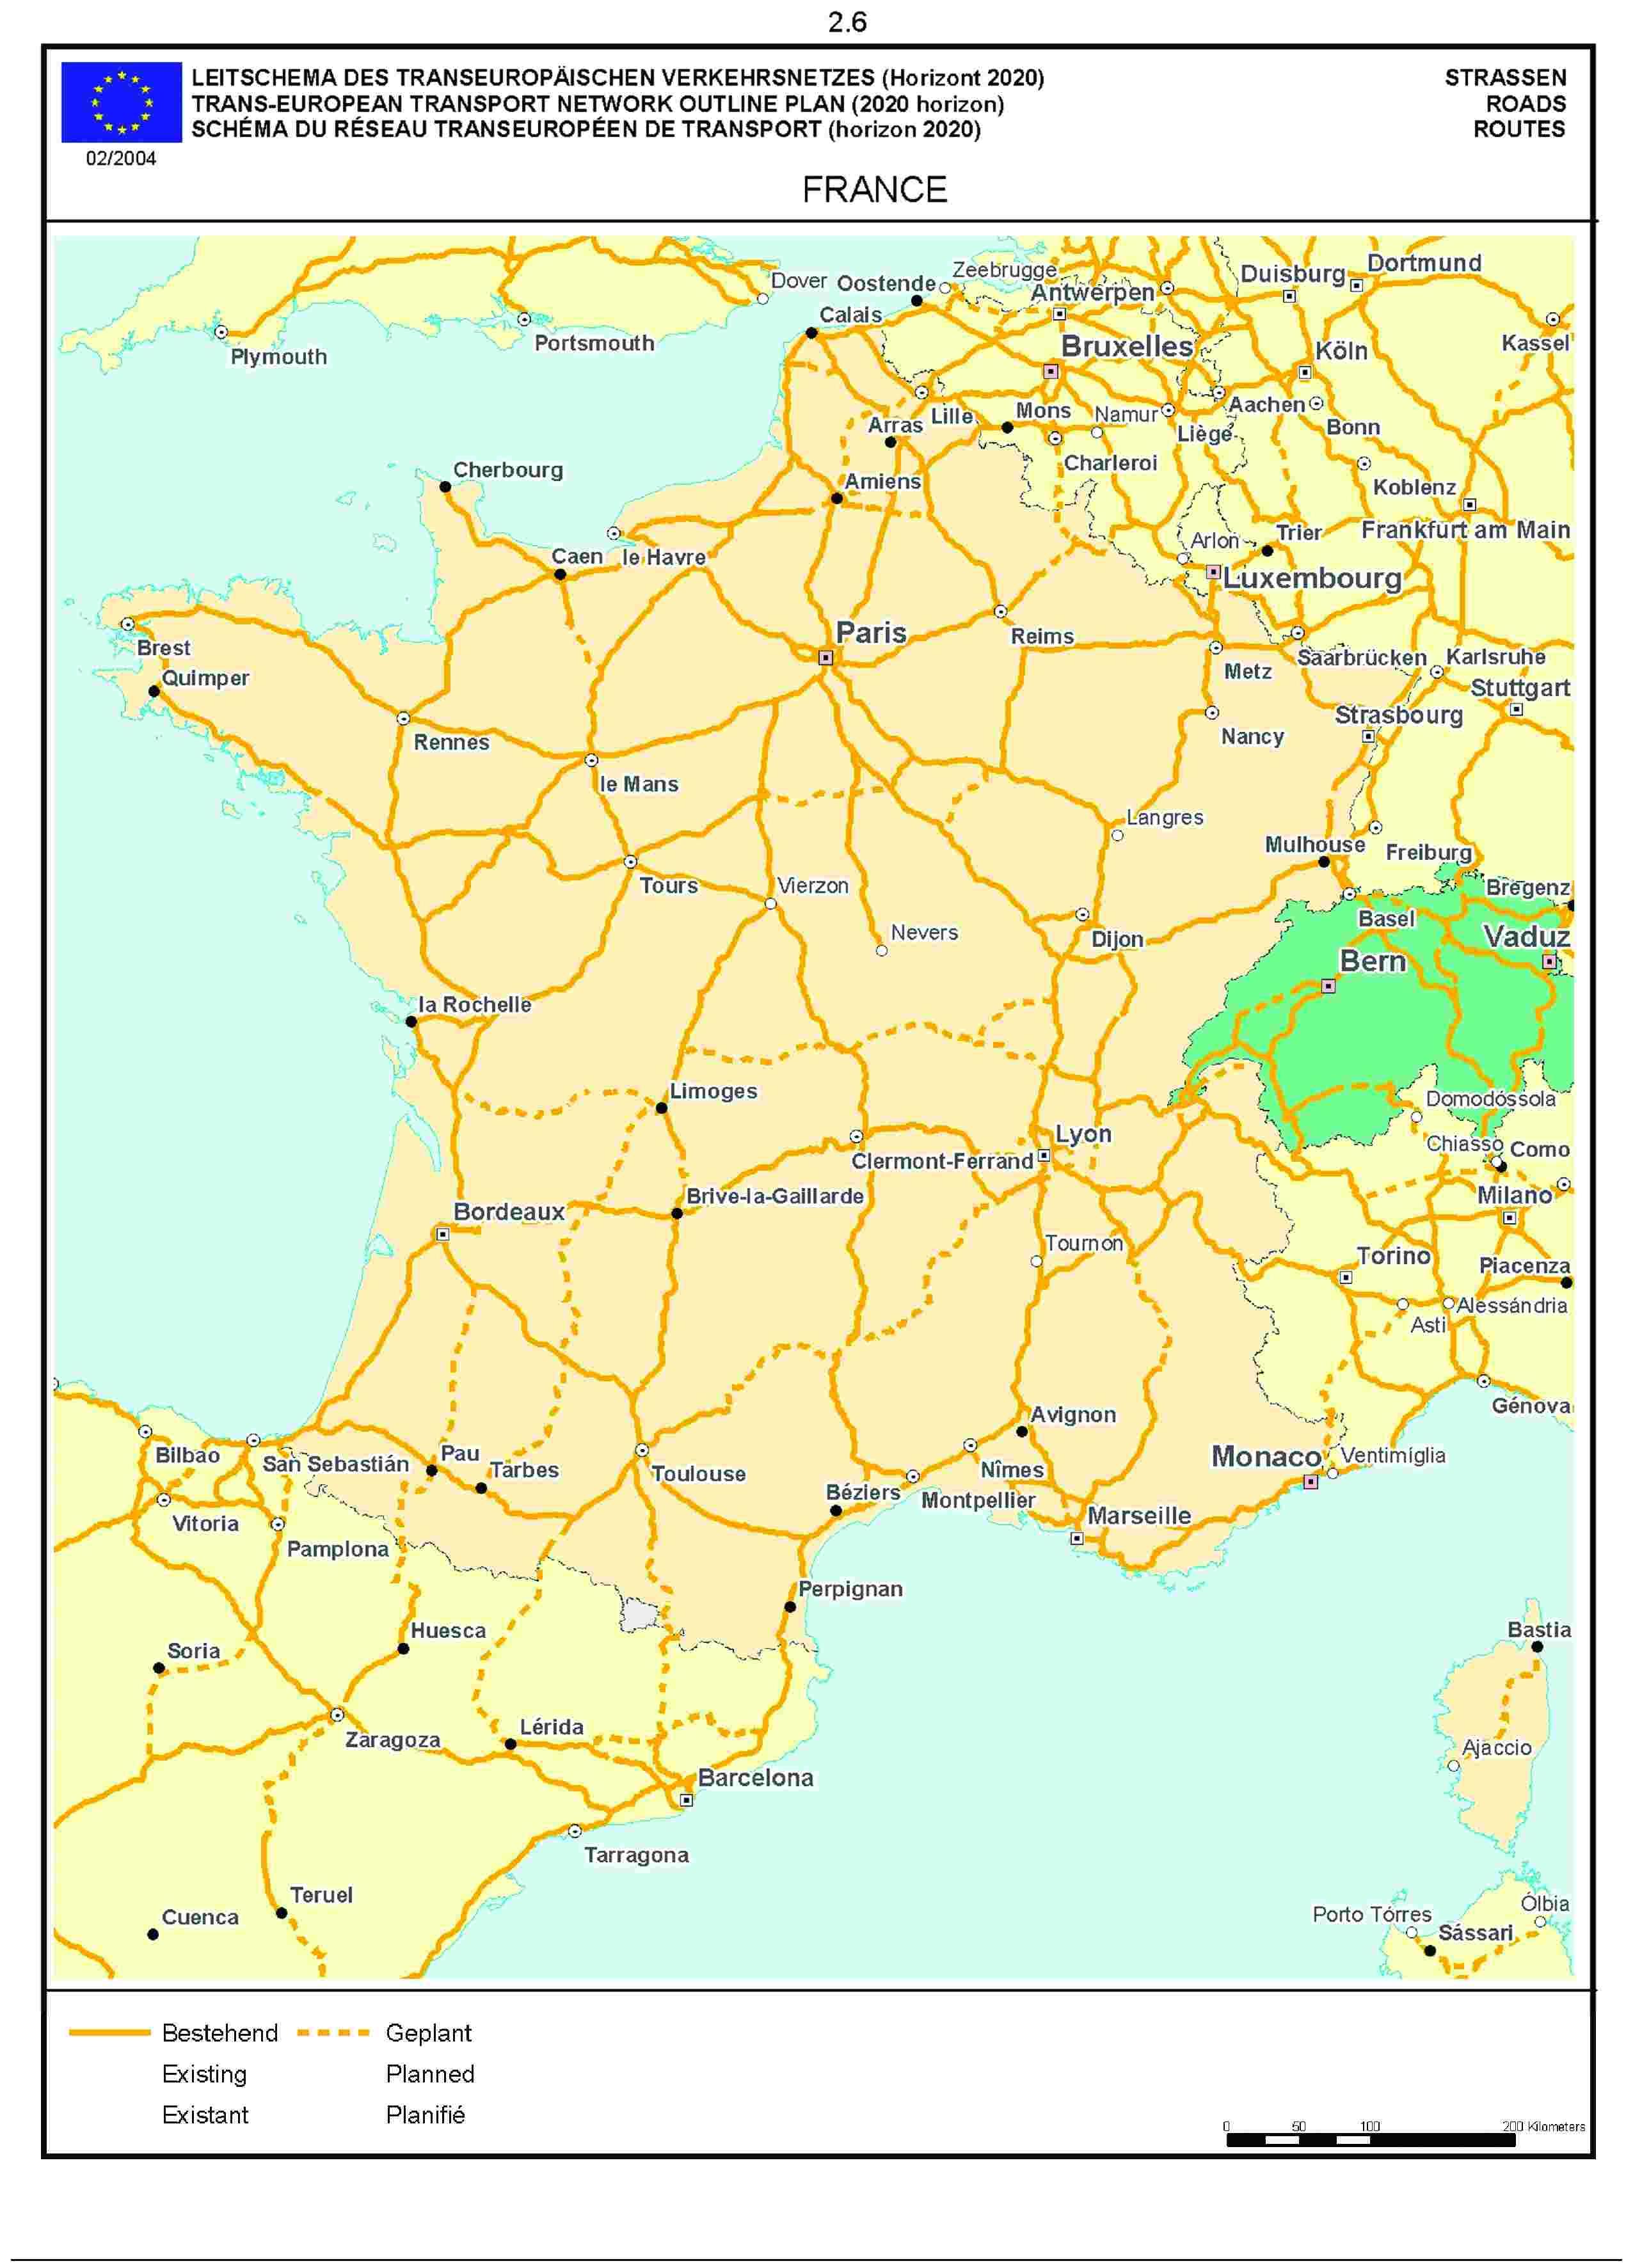 2.6LEITSCHEMA DES TRANSEUROPÄISCHEN VERKEHRSNETZES (Horizont 2020) STRASSENTRANS-EUROPEAN TRANSPORT NETWORK OUTLINE PLAN (2020 horizon) ROADSSCHÉMA DU RÉSEAU TRANSEUROPÉEN DE TRANSPORT (horizon 2020) ROUTE02/2004FRANCE